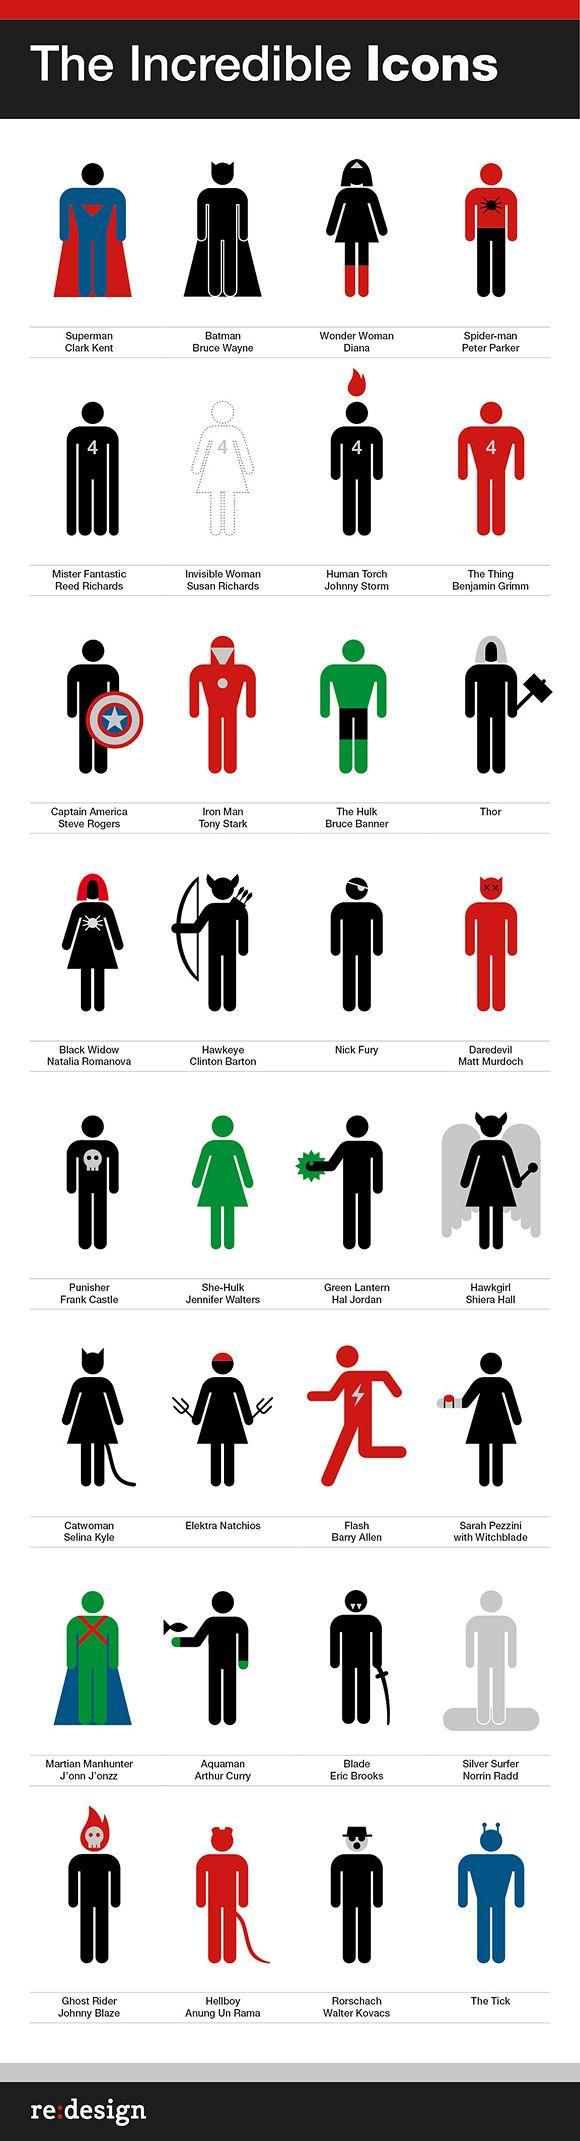 Superheroes/Supervillains icons